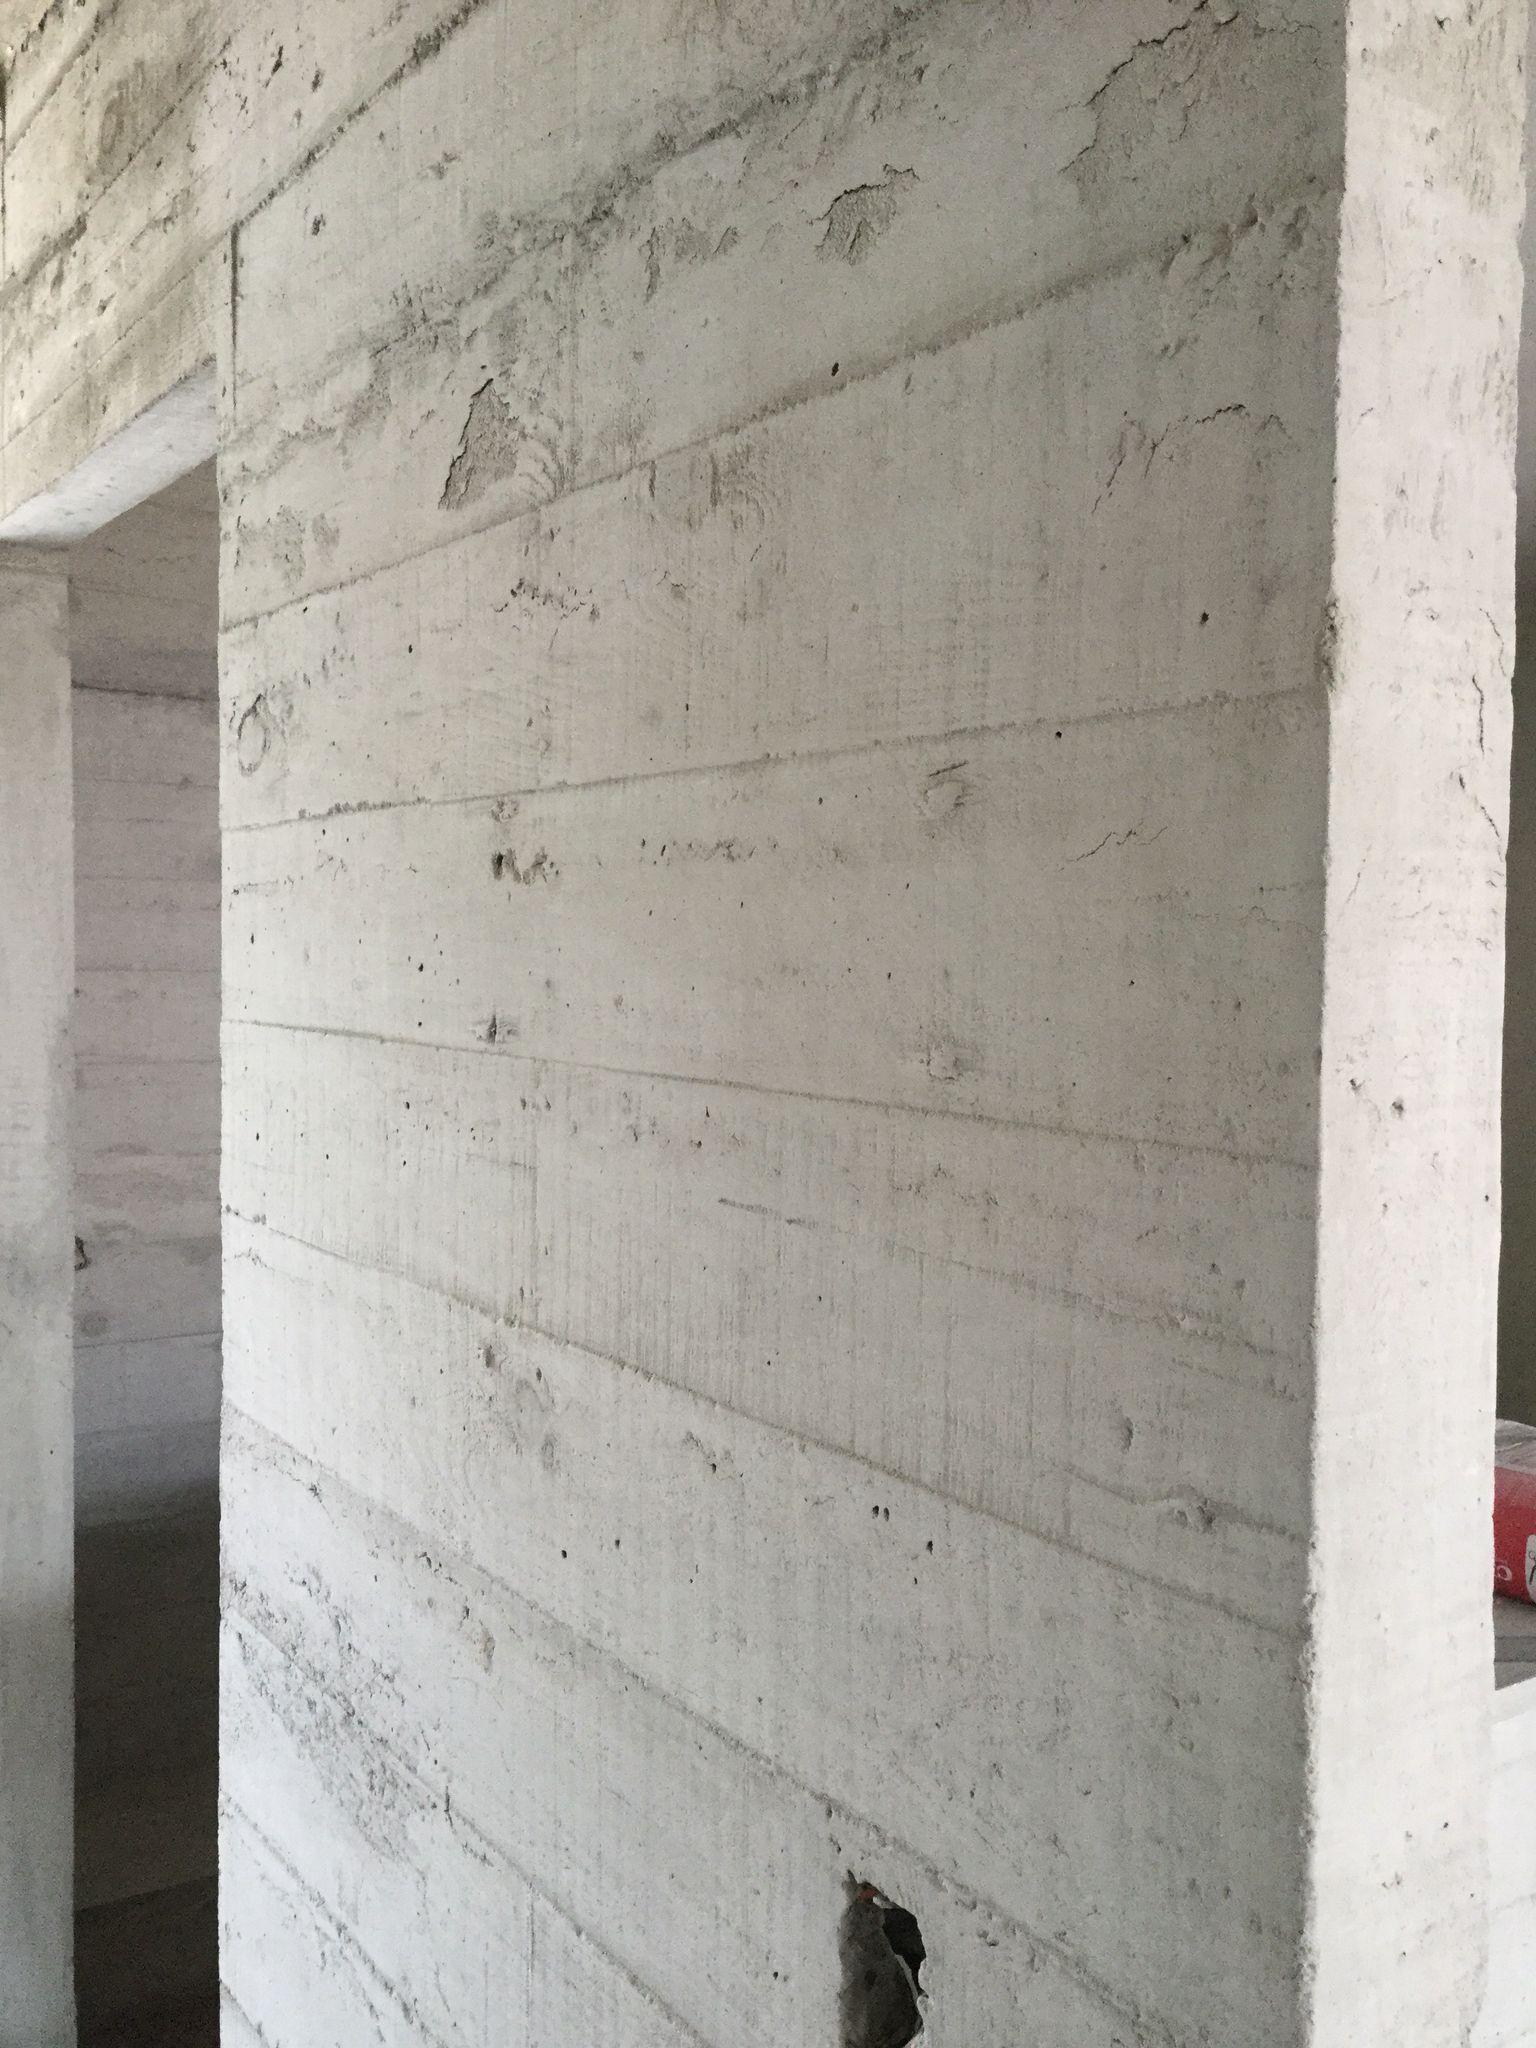 Muro de concreto aparente materiales pinterest muro de concreto muros y fachadas - Muros de hormigon ...